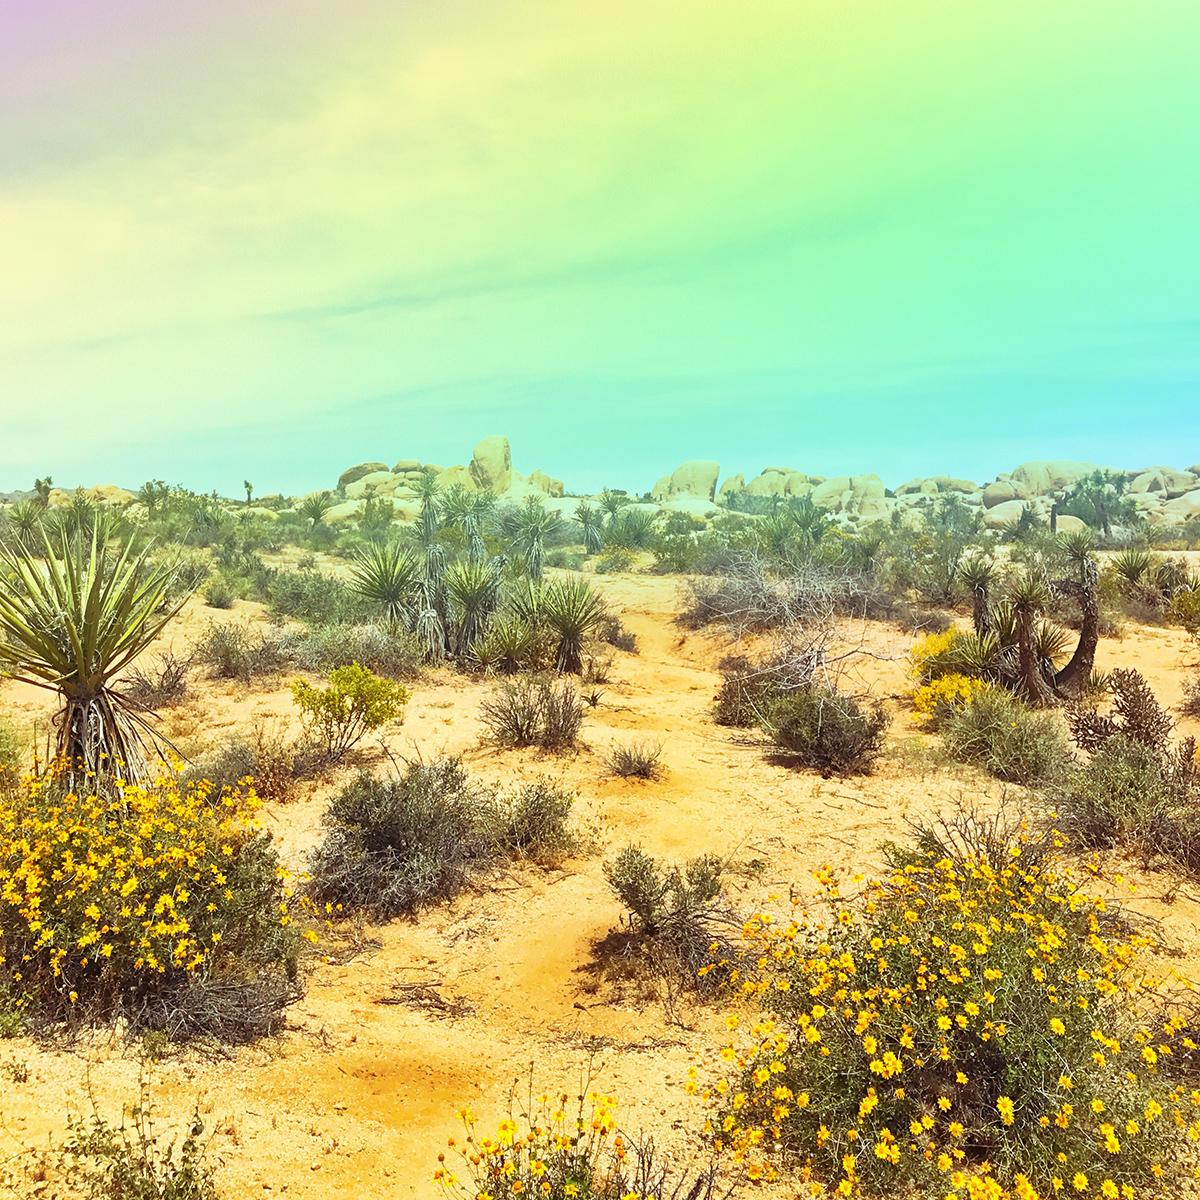 Dreamy desert scene from Joshua Tree National Park by @sarahhearts